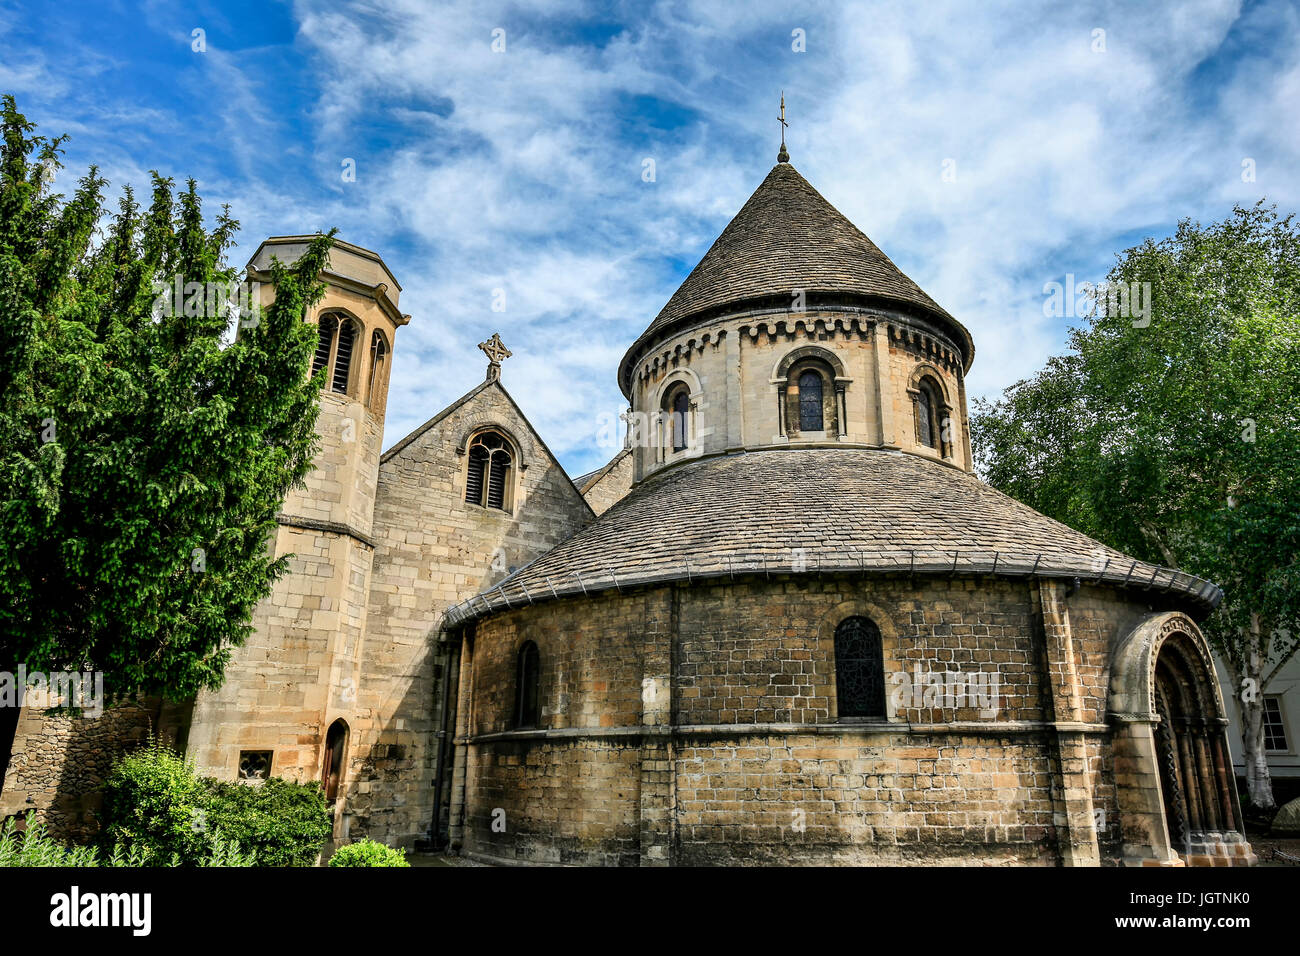 Church of the Holy Sepulchre (The Round Church), Cambridge, Cambridgeshire, England, United Kingdom - Stock Image